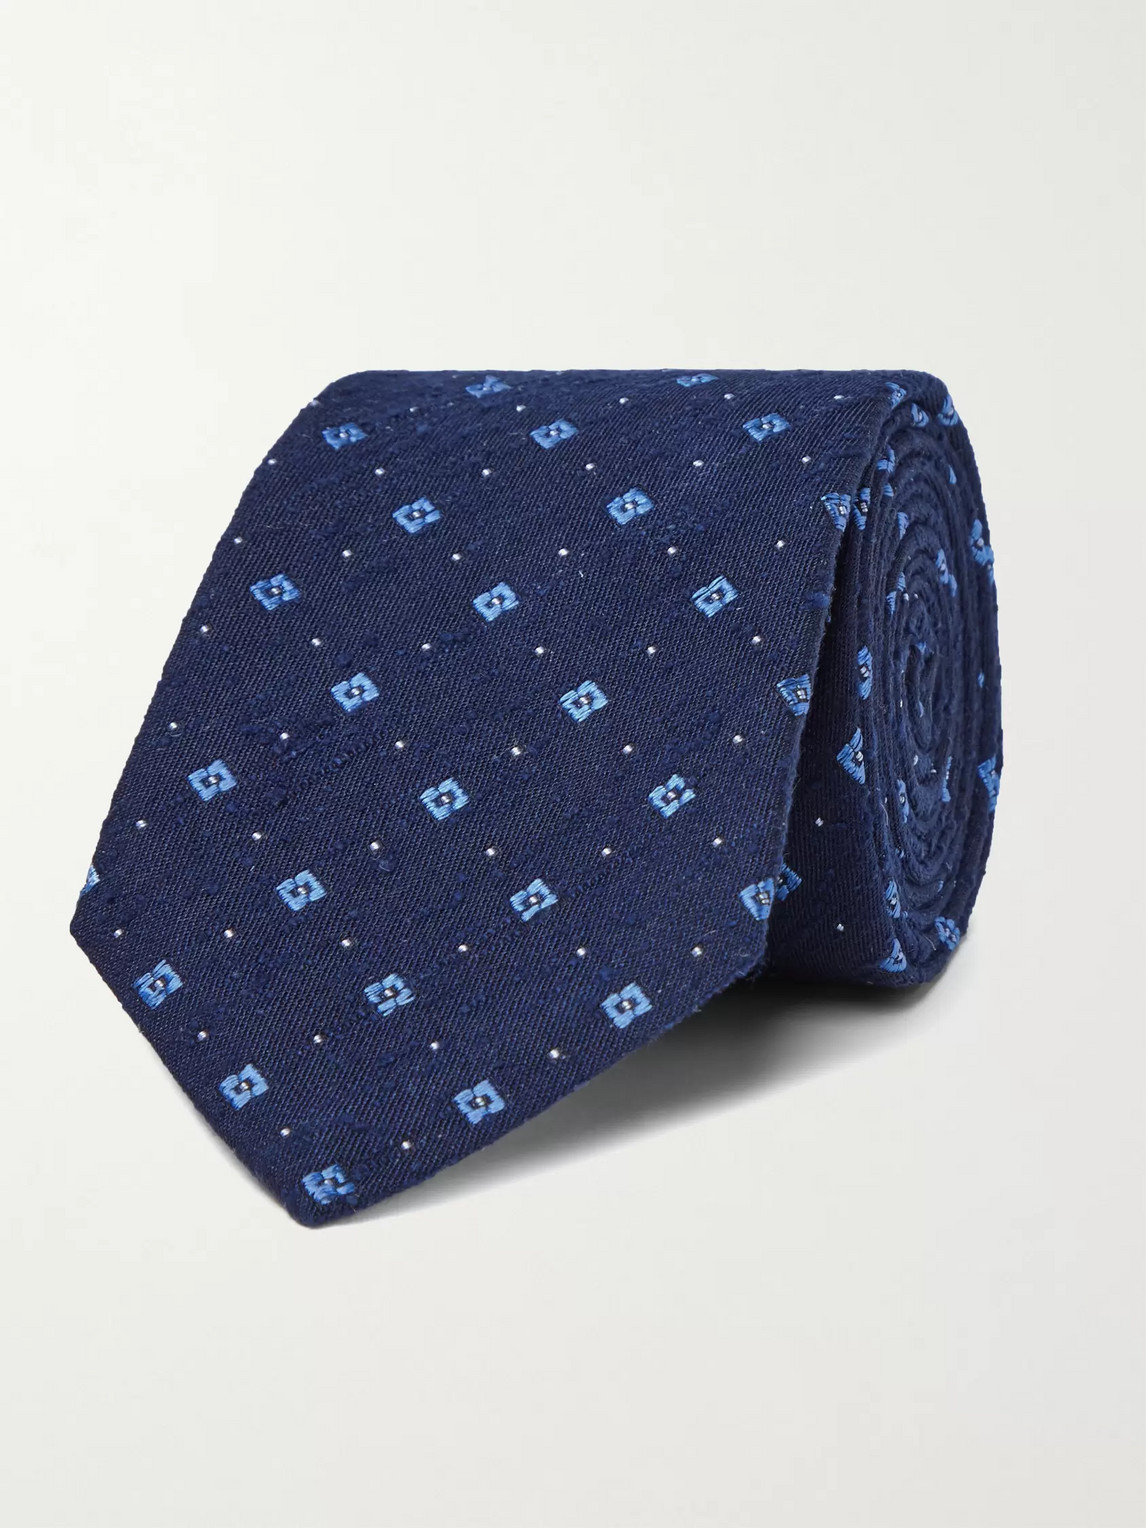 Turnbull & Asser 8cm Slub Silk-jacquard Tie In Blue